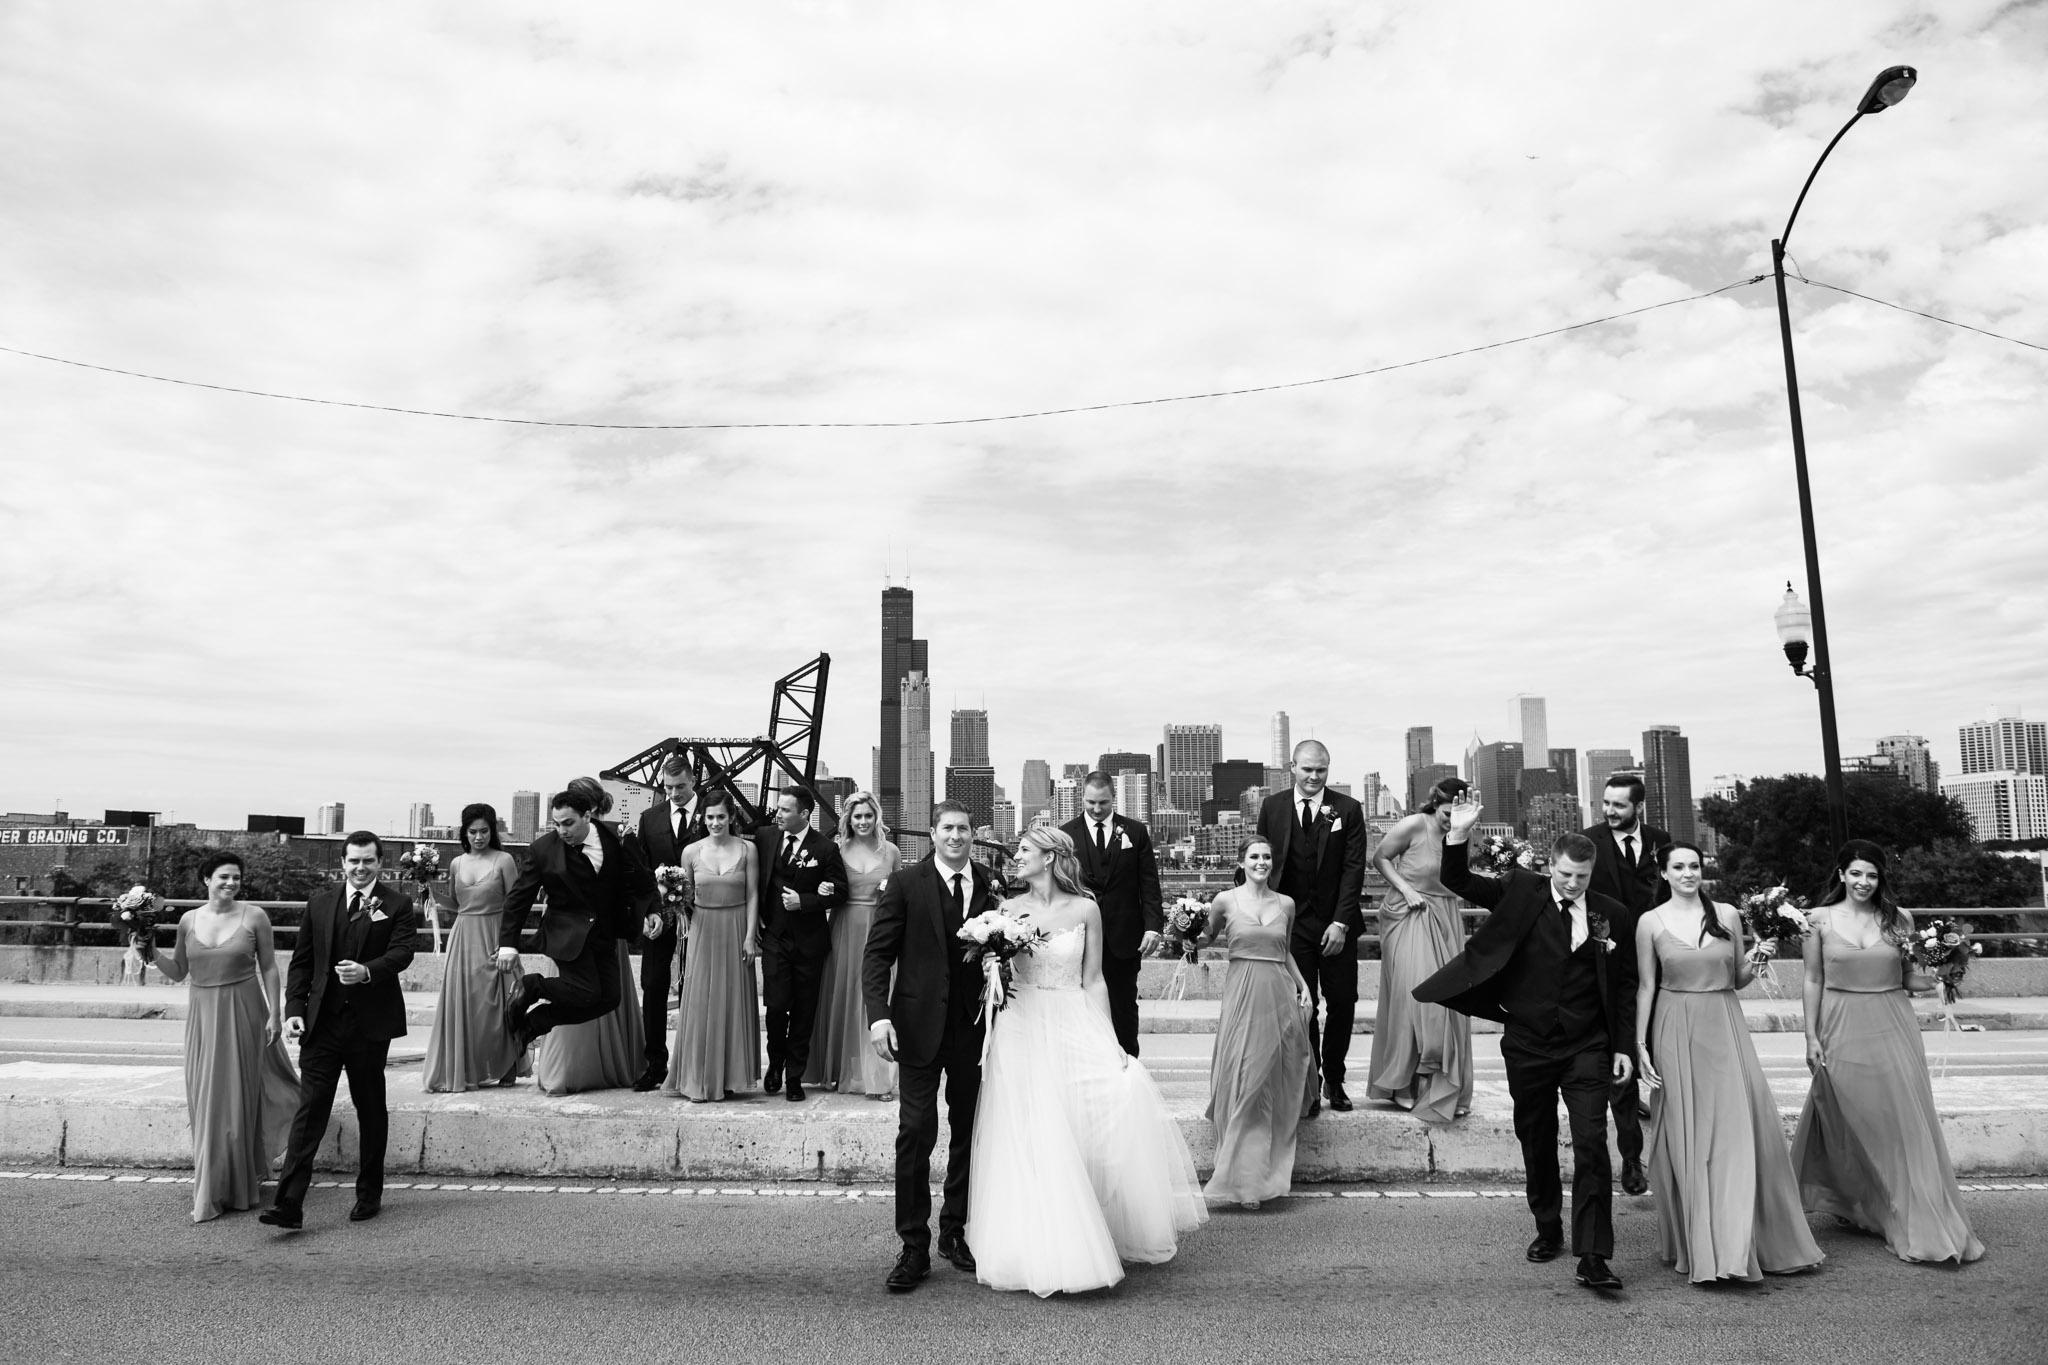 bridgeport-art-center-wedding-photos-15.jpg